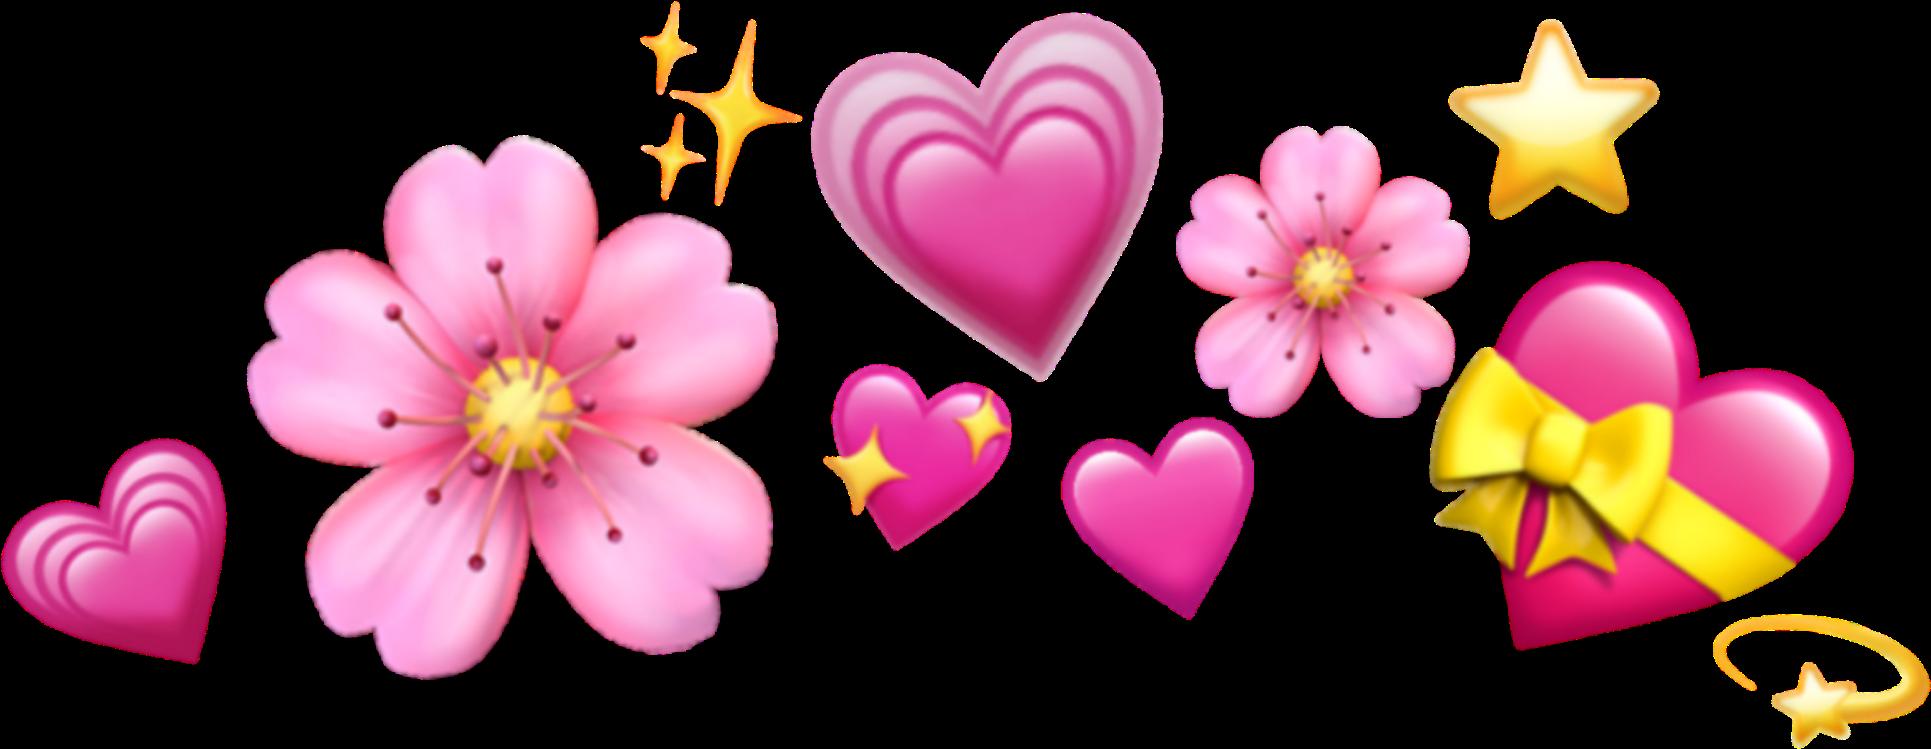 Download Emoji Crown Hearts Emojis Tumblr Icon Sticker Janaina